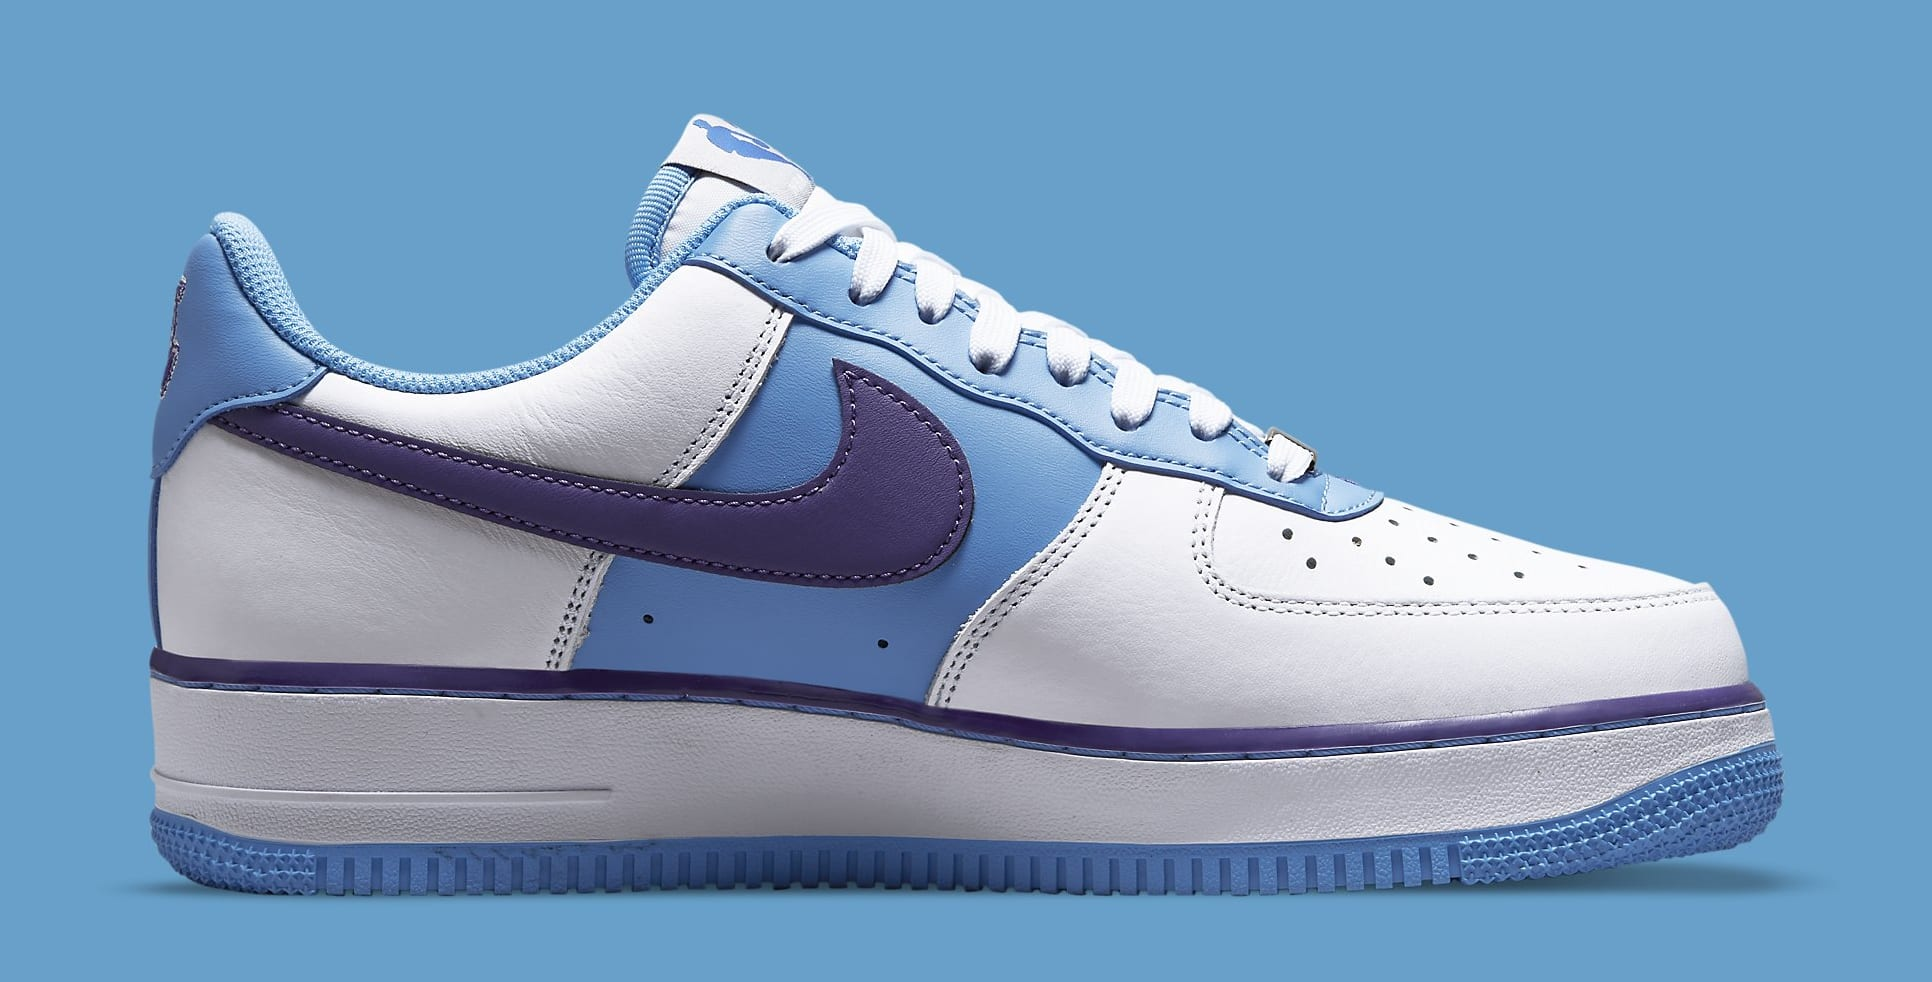 Nike Air Force 1 Low 'Lakers' NBA 75th Anniversary DC8874-101 Medial